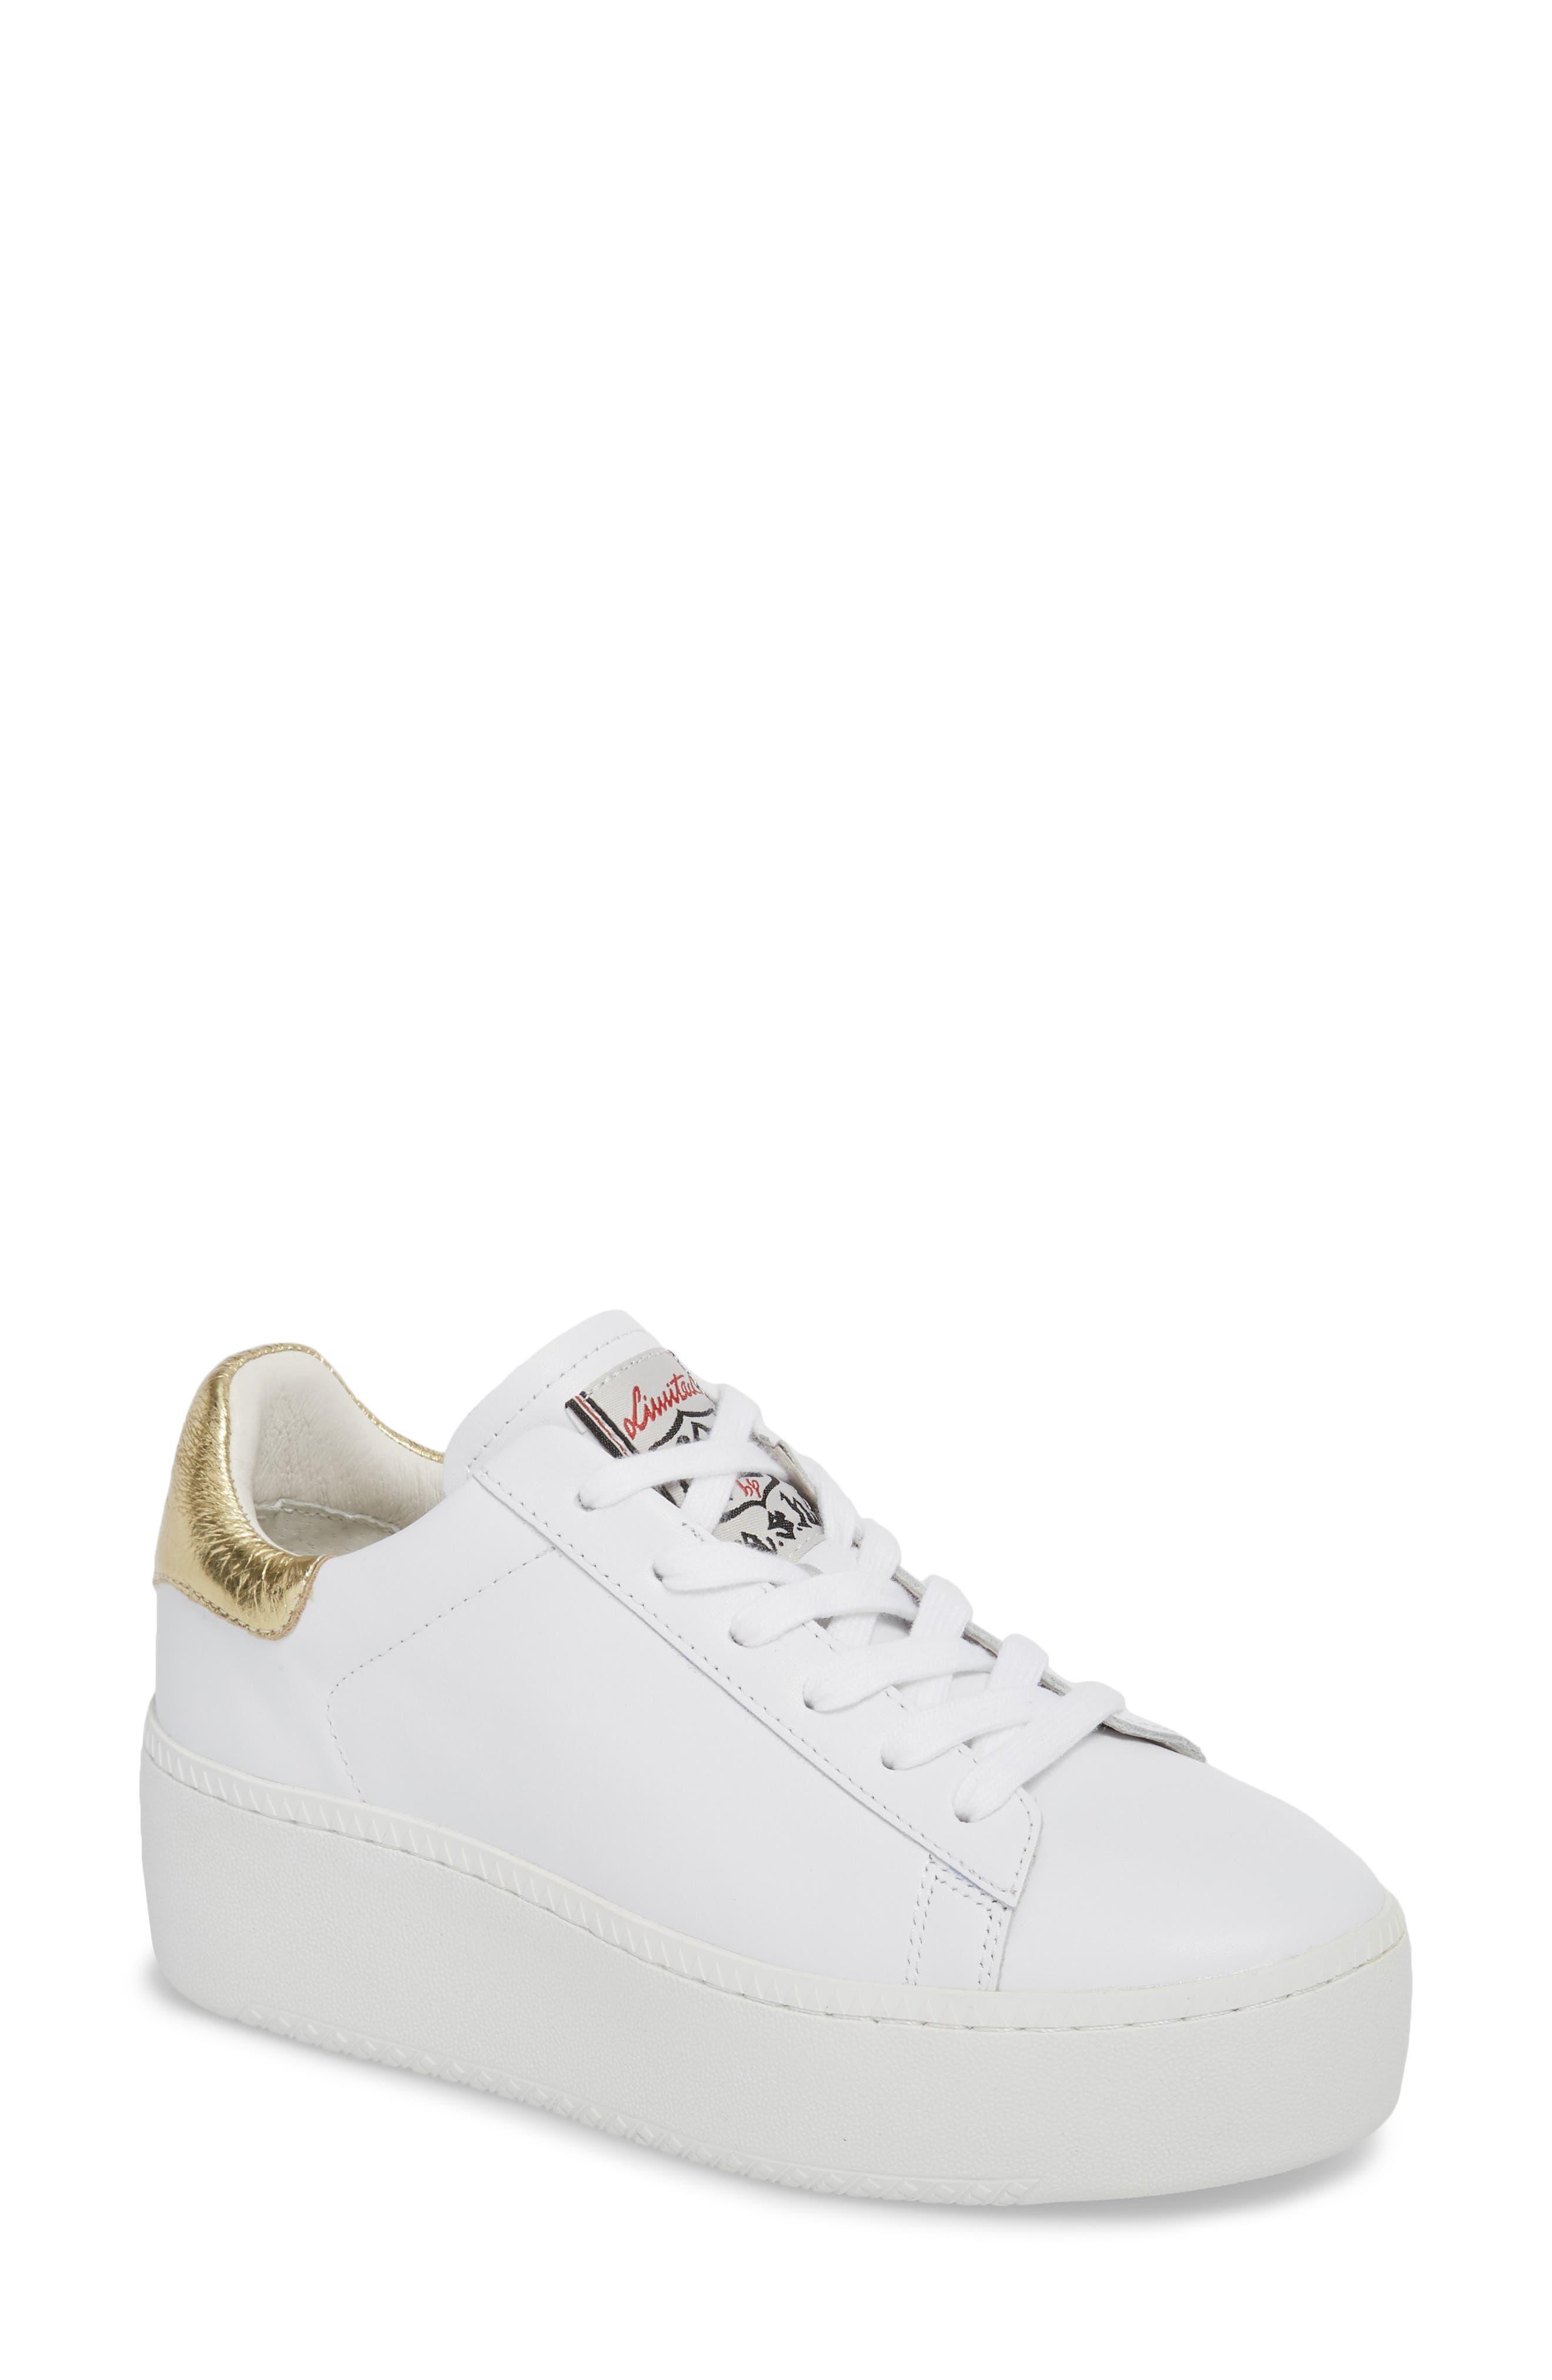 Cult Platform Sneaker,                         Main,                         color, 100